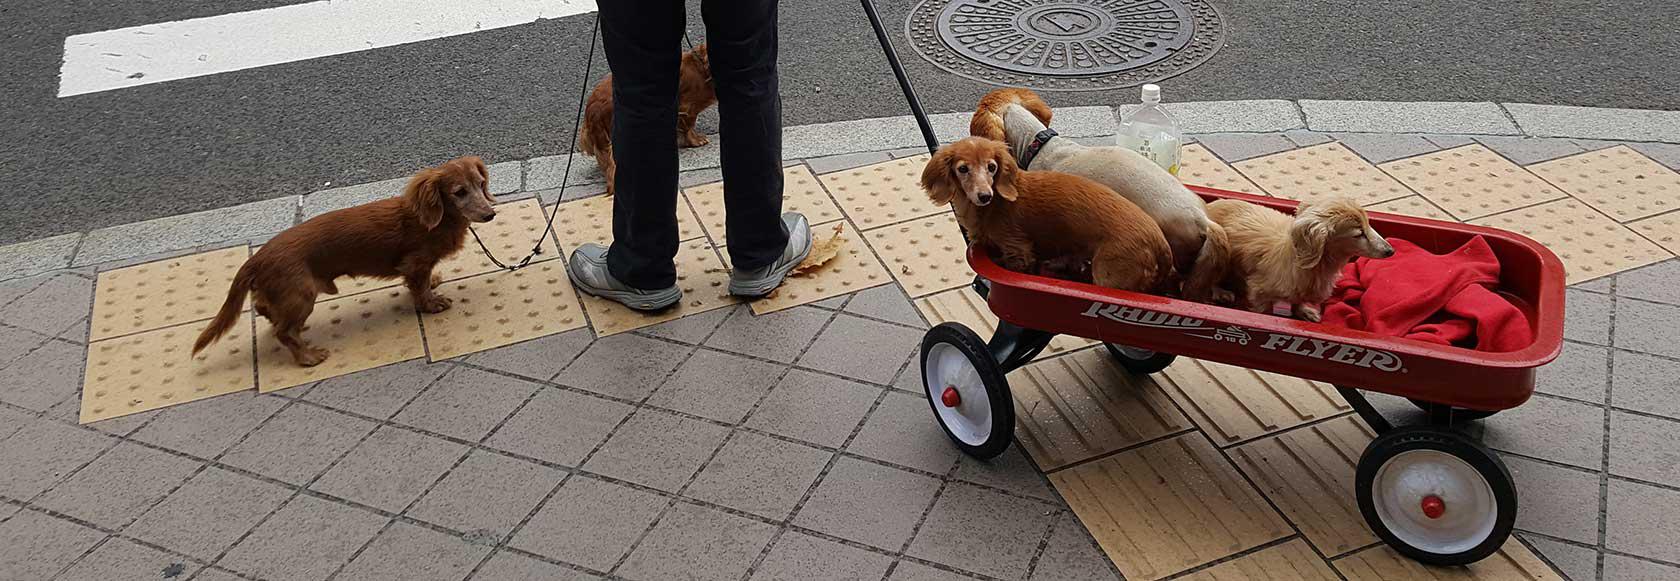 cycling Hokkaido, Japan